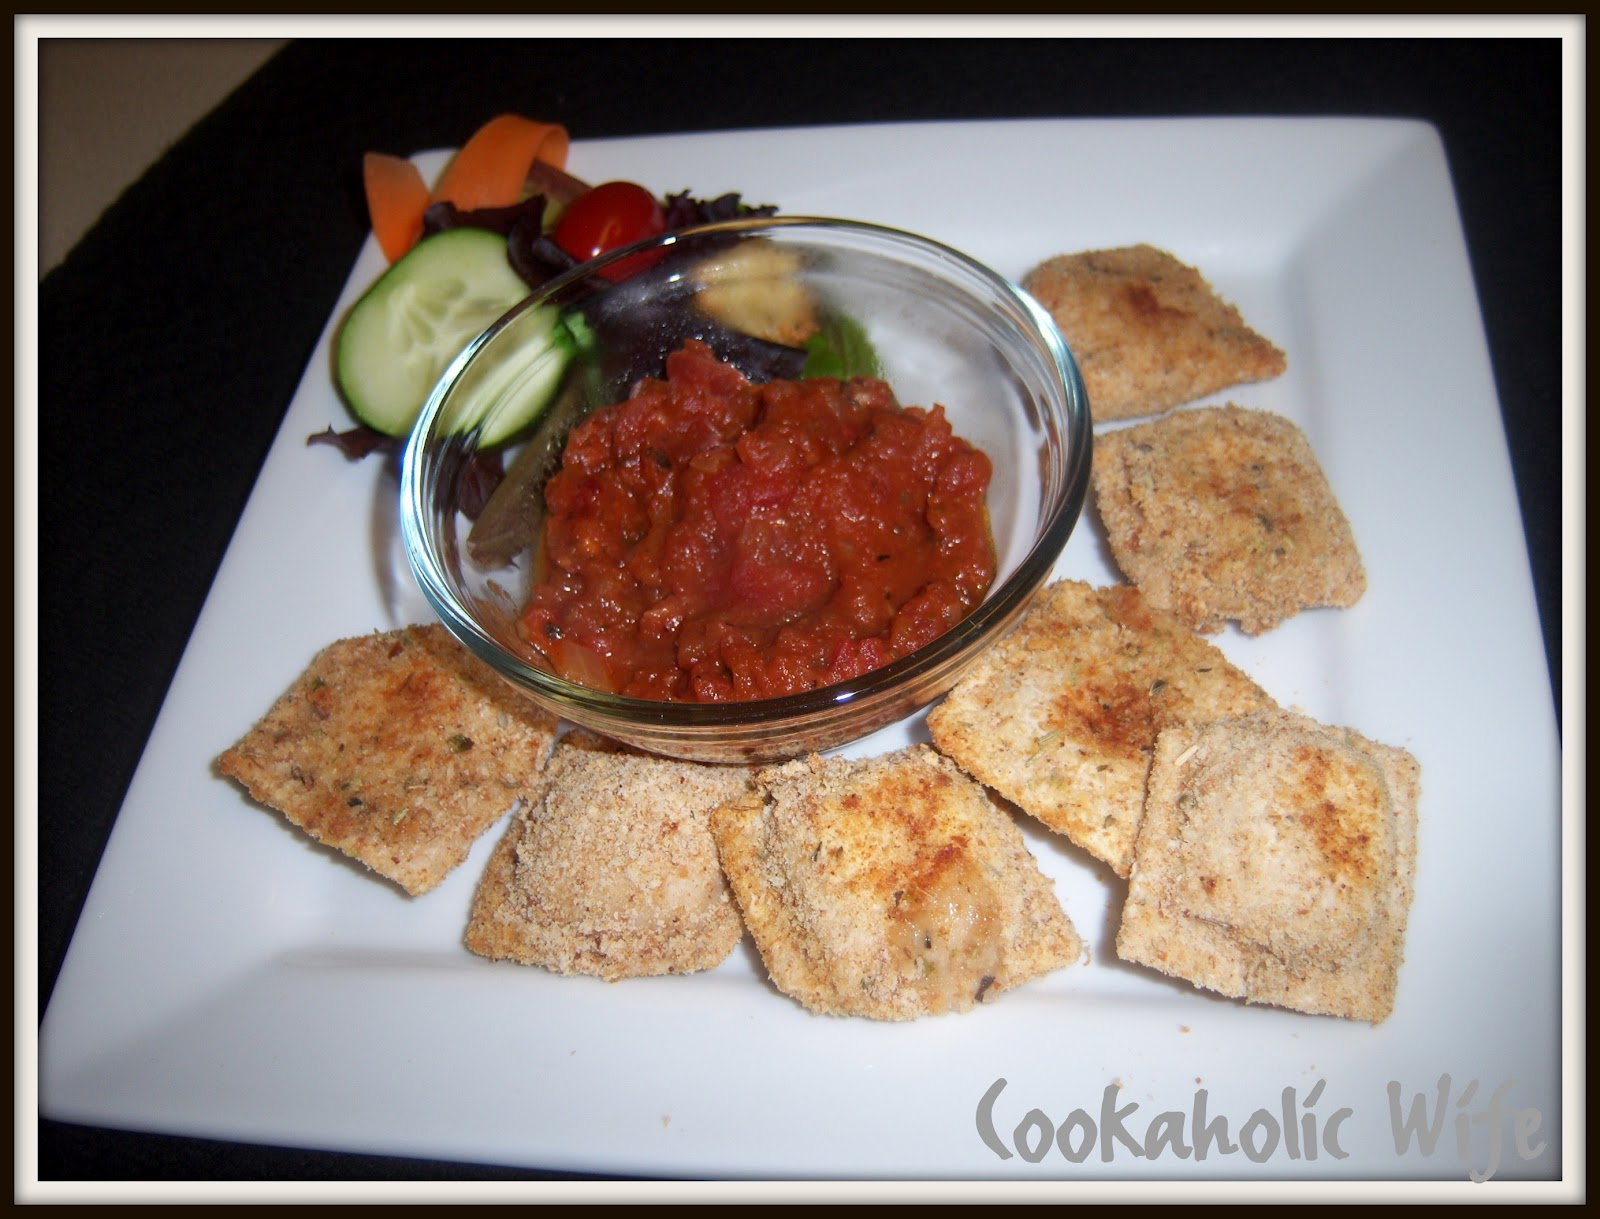 Cookaholic Wife: Toasted Ravioli with Marinara Sauce